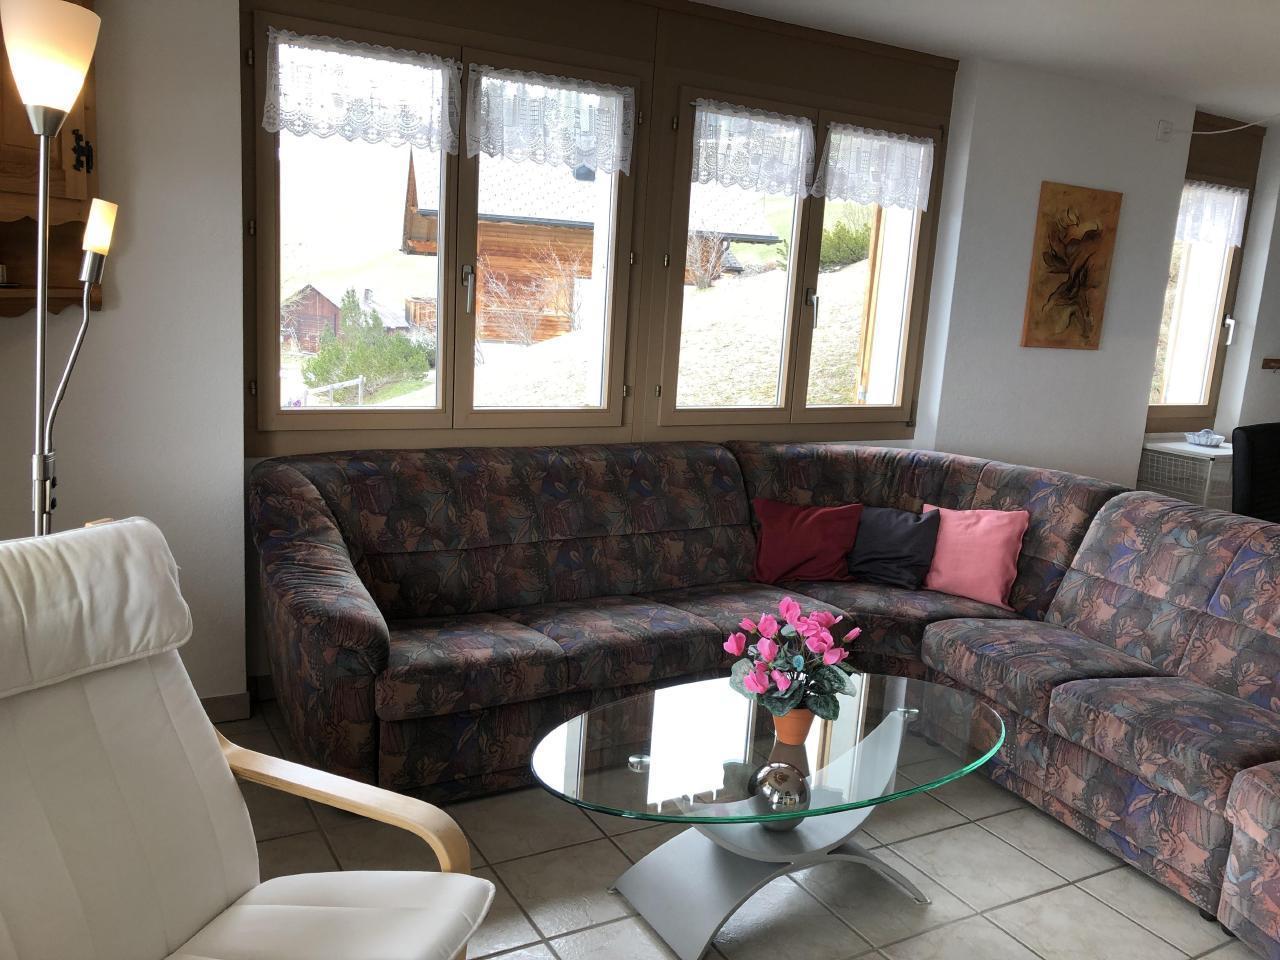 Appartement de vacances Chalet Wieseli 4-Bettwohnung (2692215), Hasliberg Wasserwendi, Meiringen - Hasliberg, Oberland bernois, Suisse, image 6